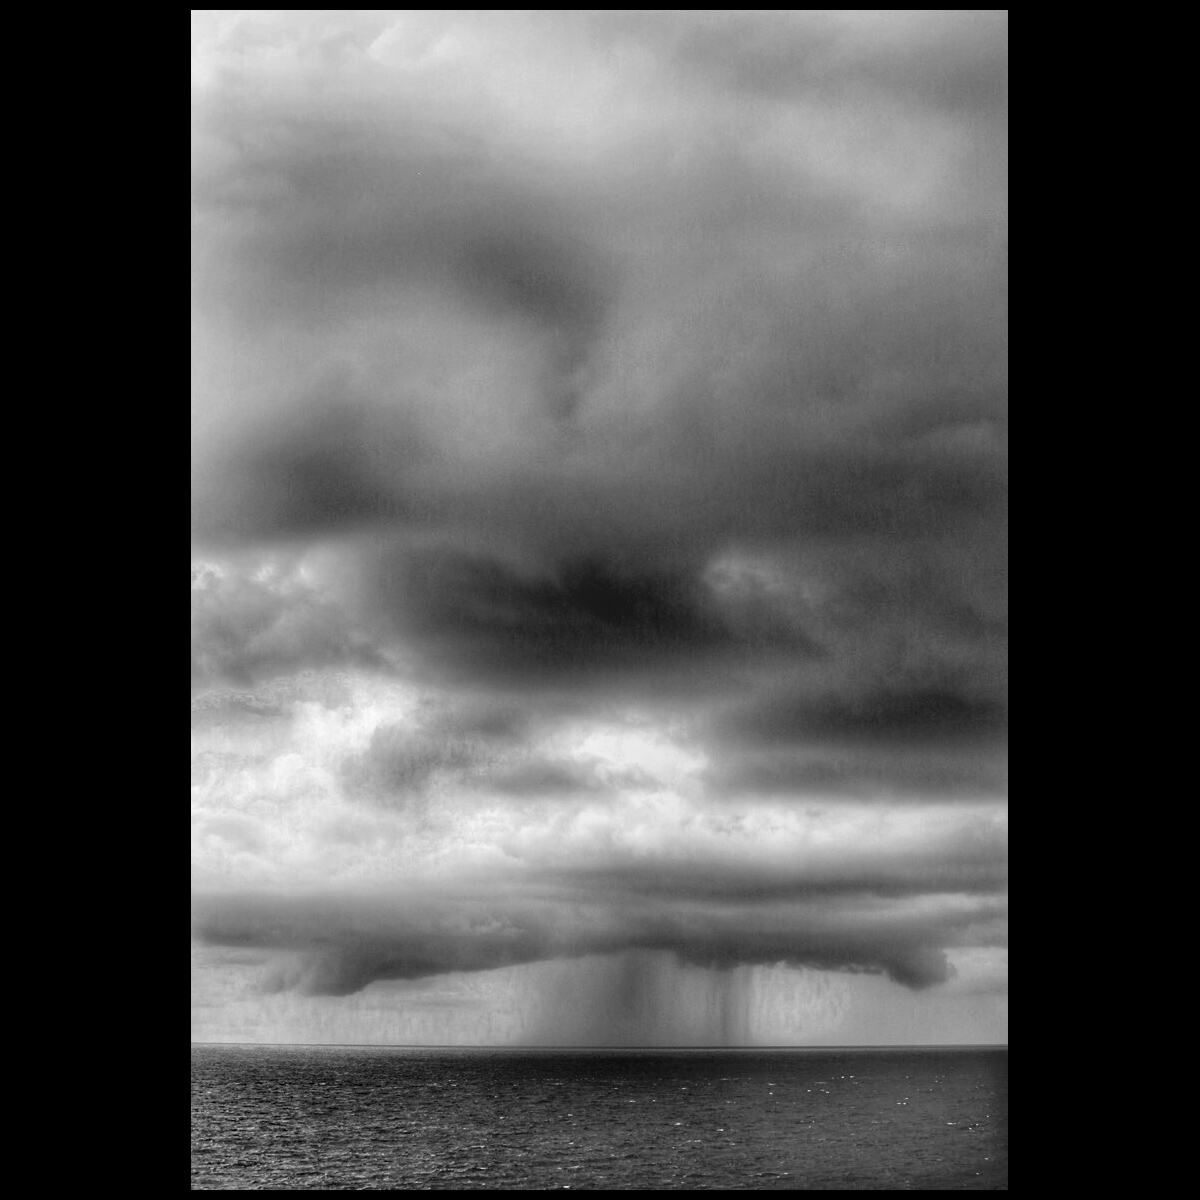 rainsquall